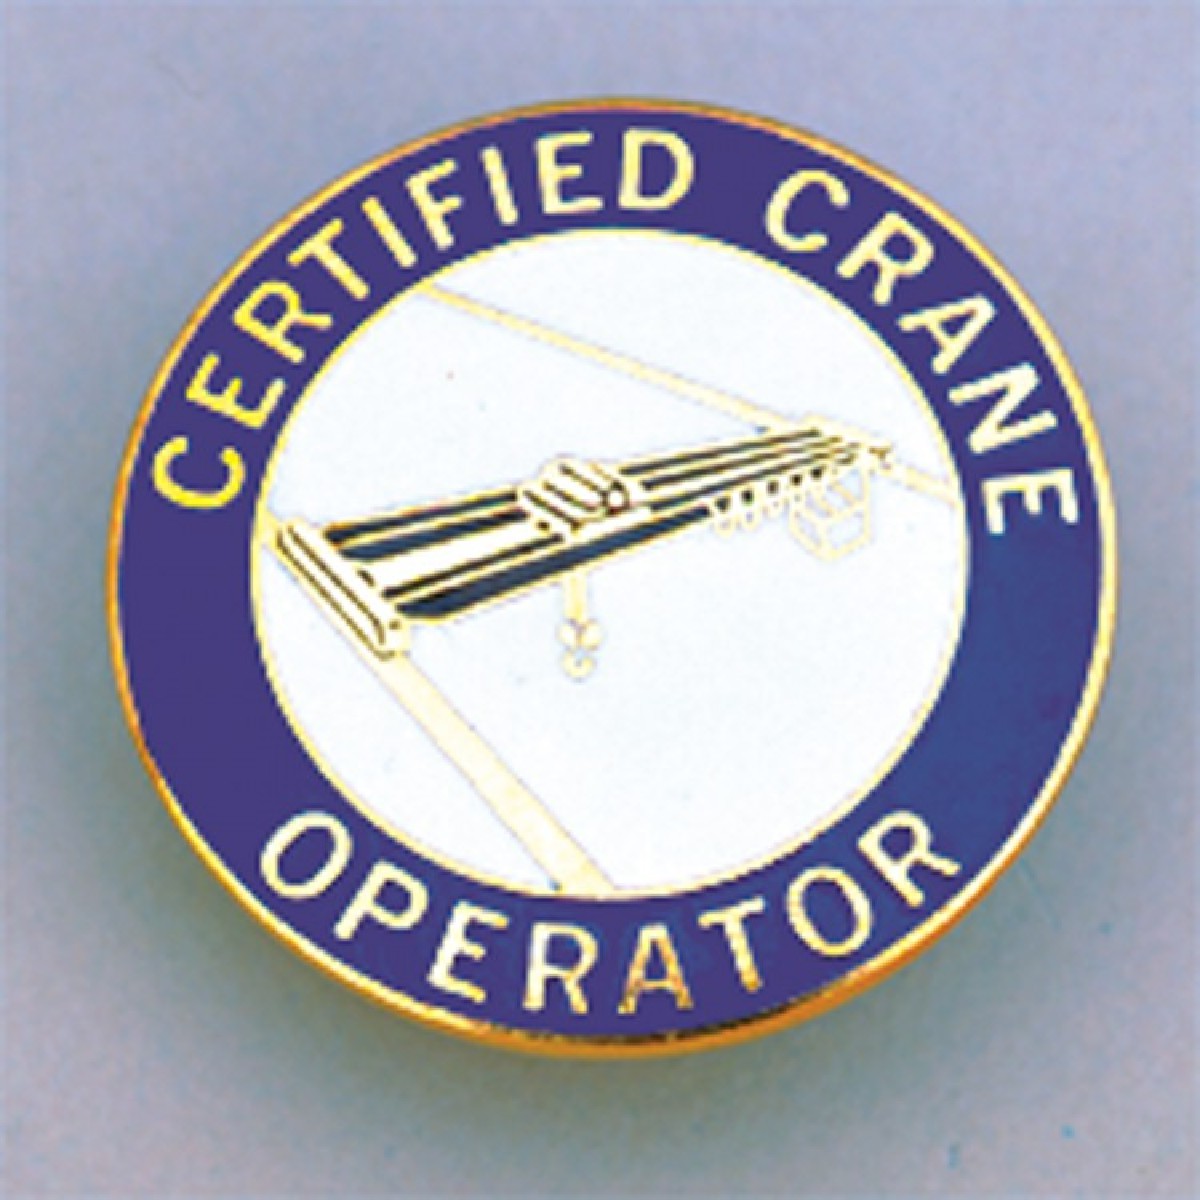 CERTIFIED CRANE OPERATOR (OVERHEAD CRANE)